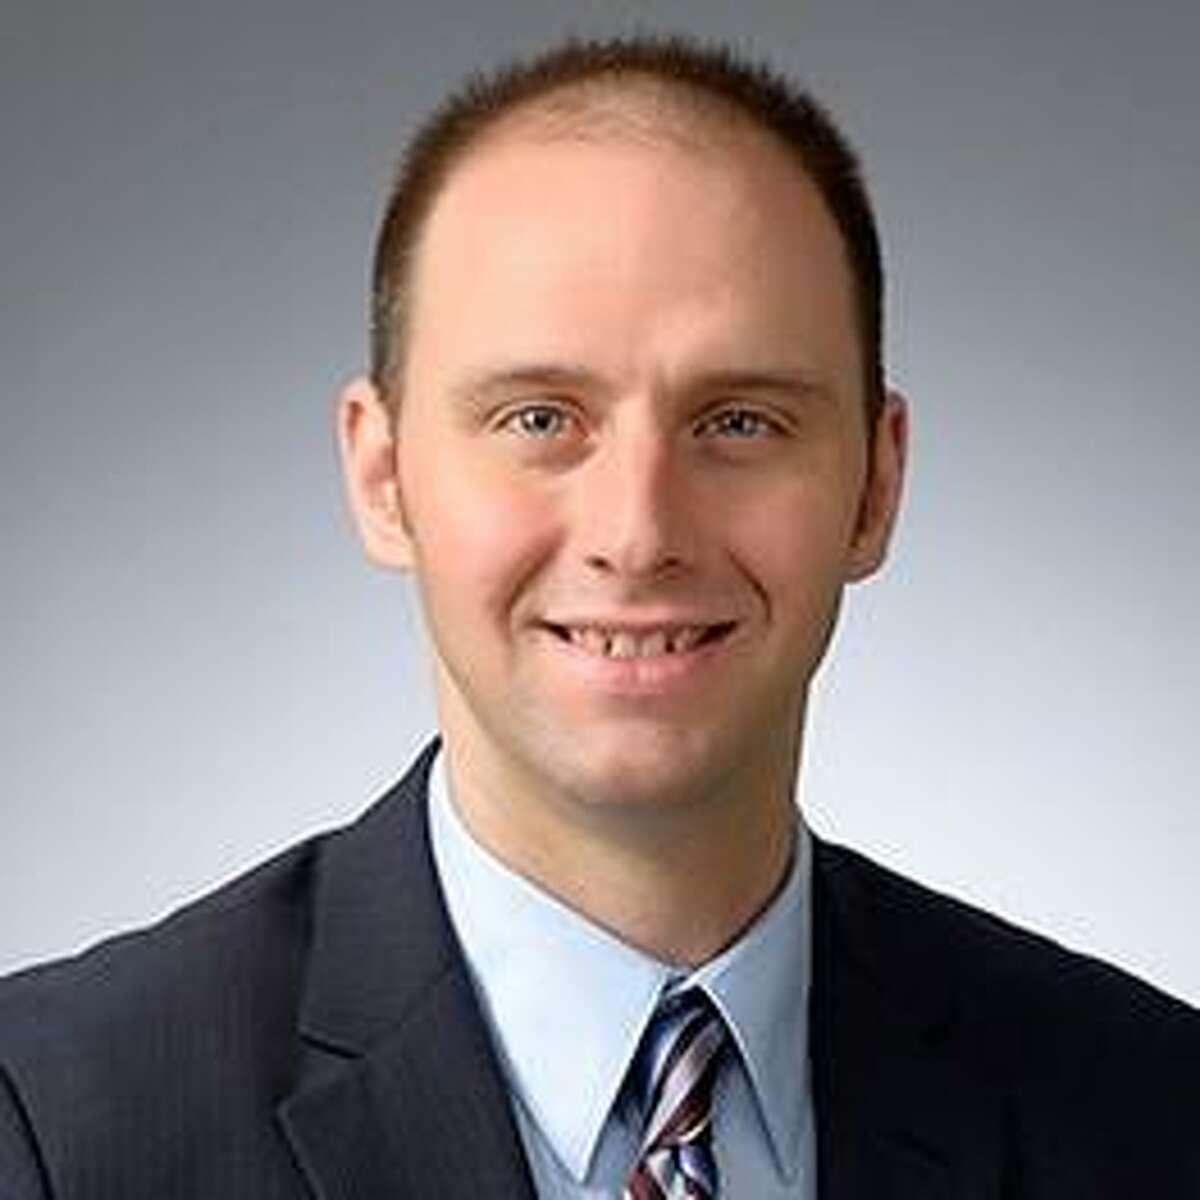 Jared Smith